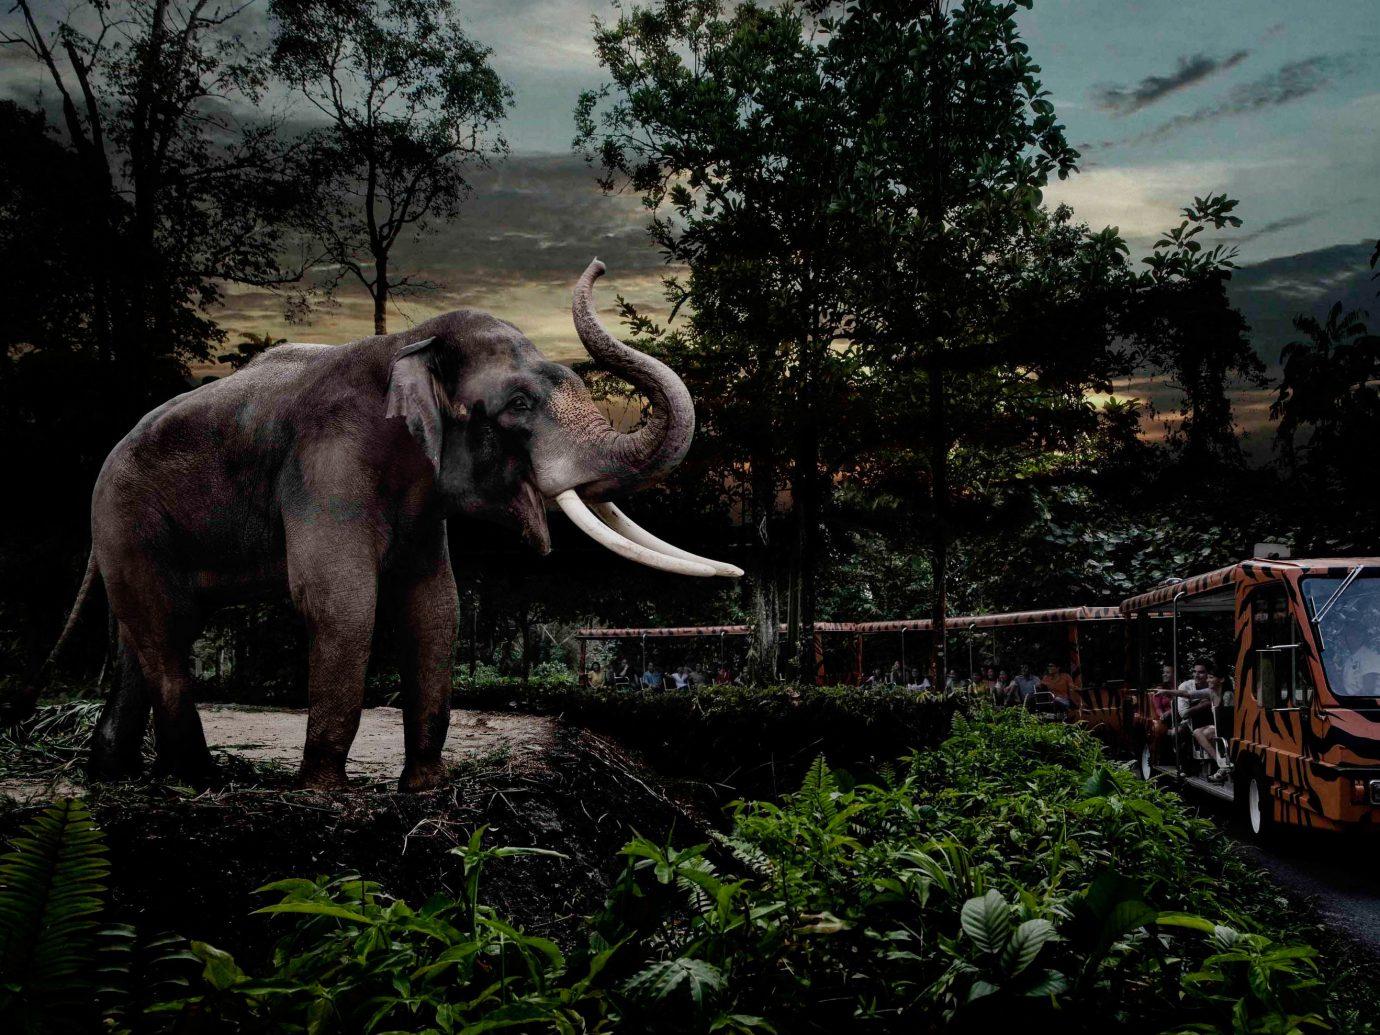 Arts + Culture Singapore Southeast Asia Trip Ideas tree outdoor elephant elephants and mammoths Wildlife wilderness tusk plant indian elephant standing Forest grass national park Jungle landscape sky Safari dirt